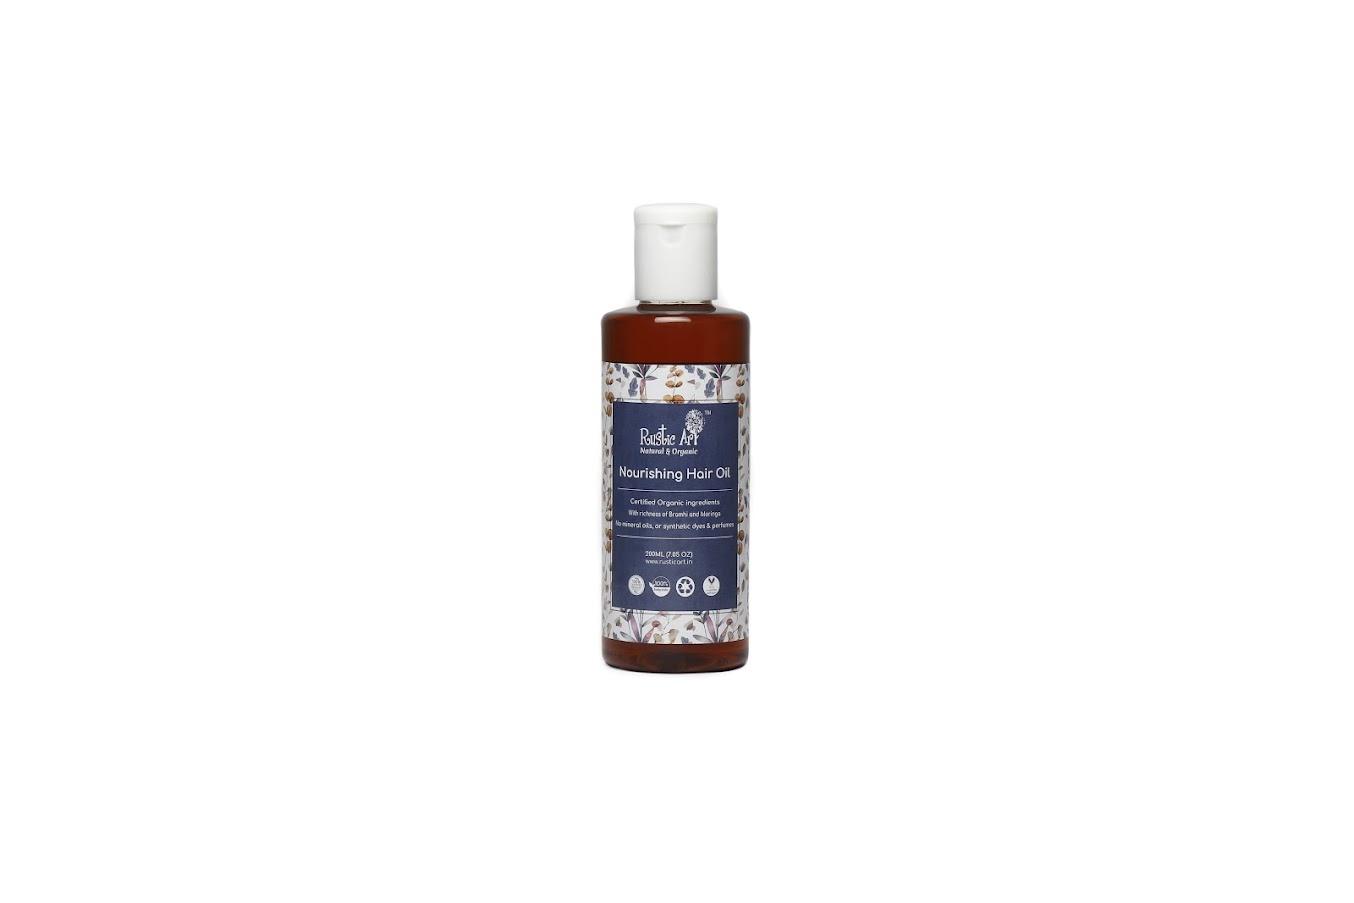 Rustic Art Organic Nourishing Hair Oil